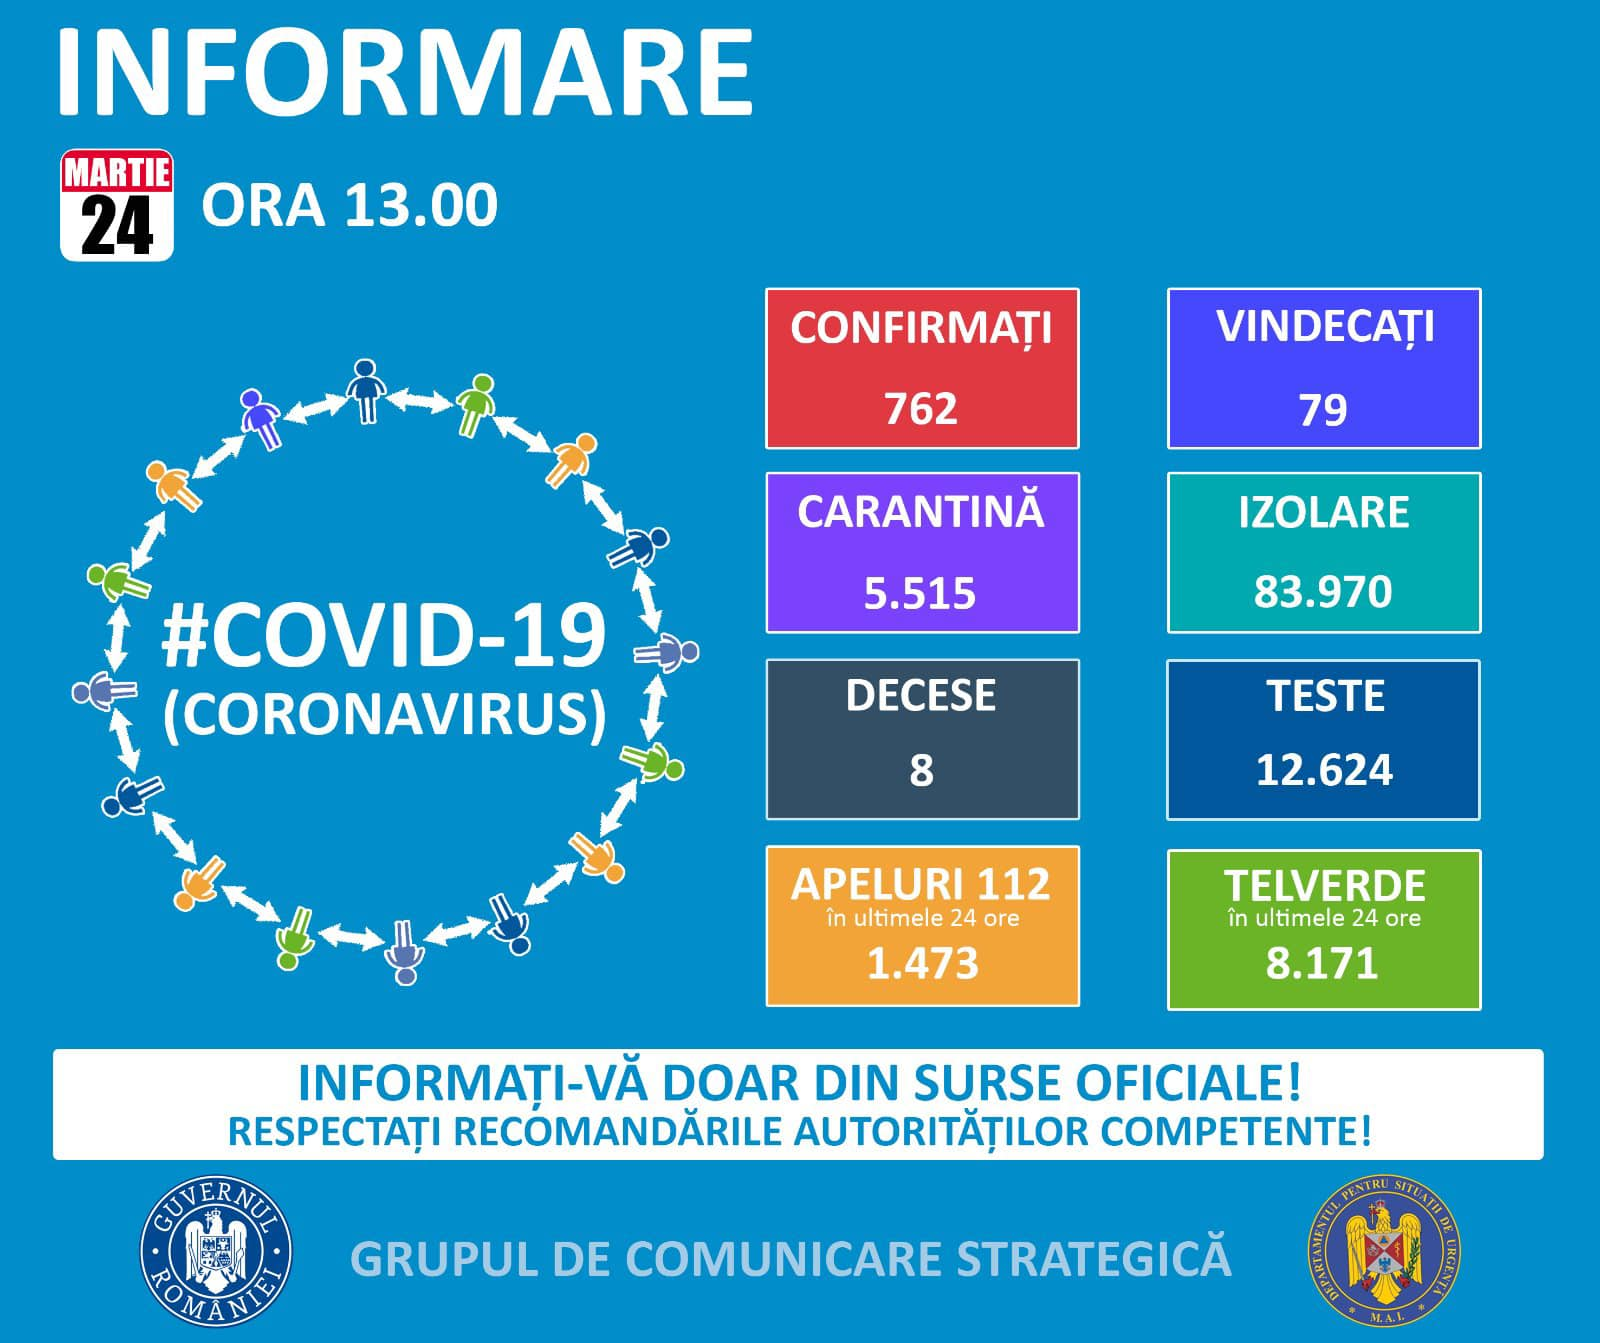 Coronavirus Romania DSU informare situatie cazuri vindecari decese 24 martie